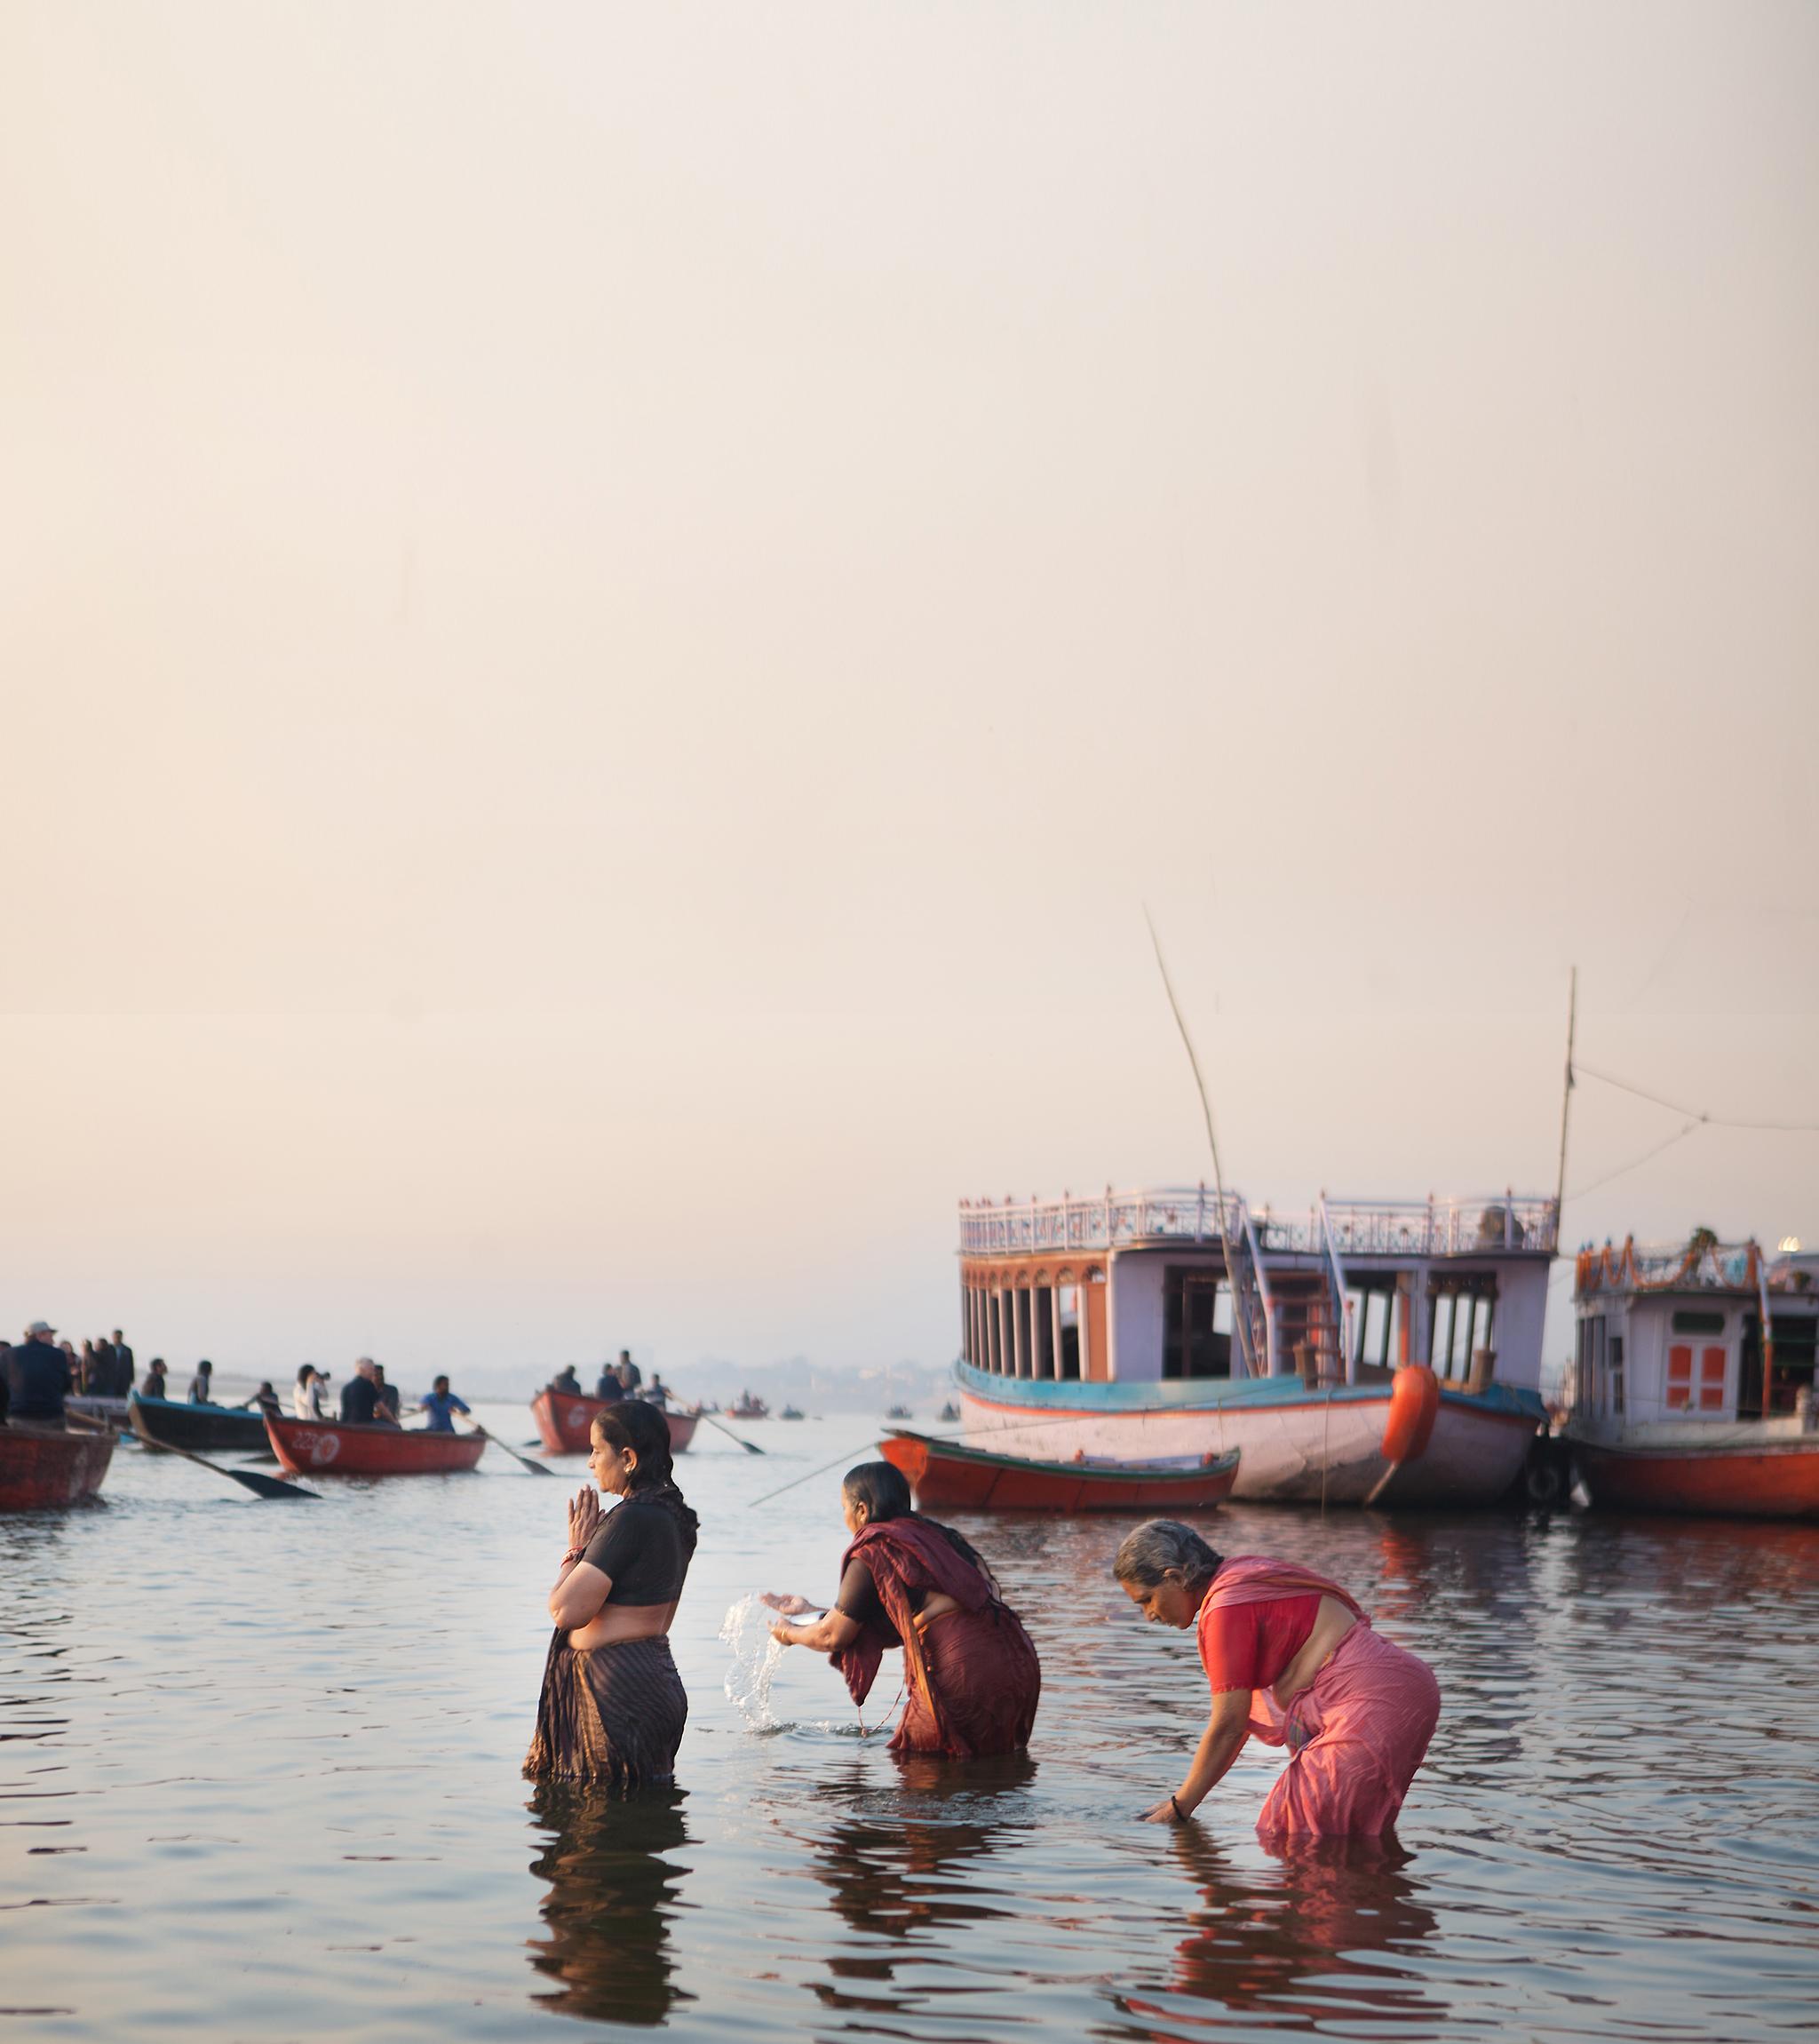 India-qfb410lr.jpg